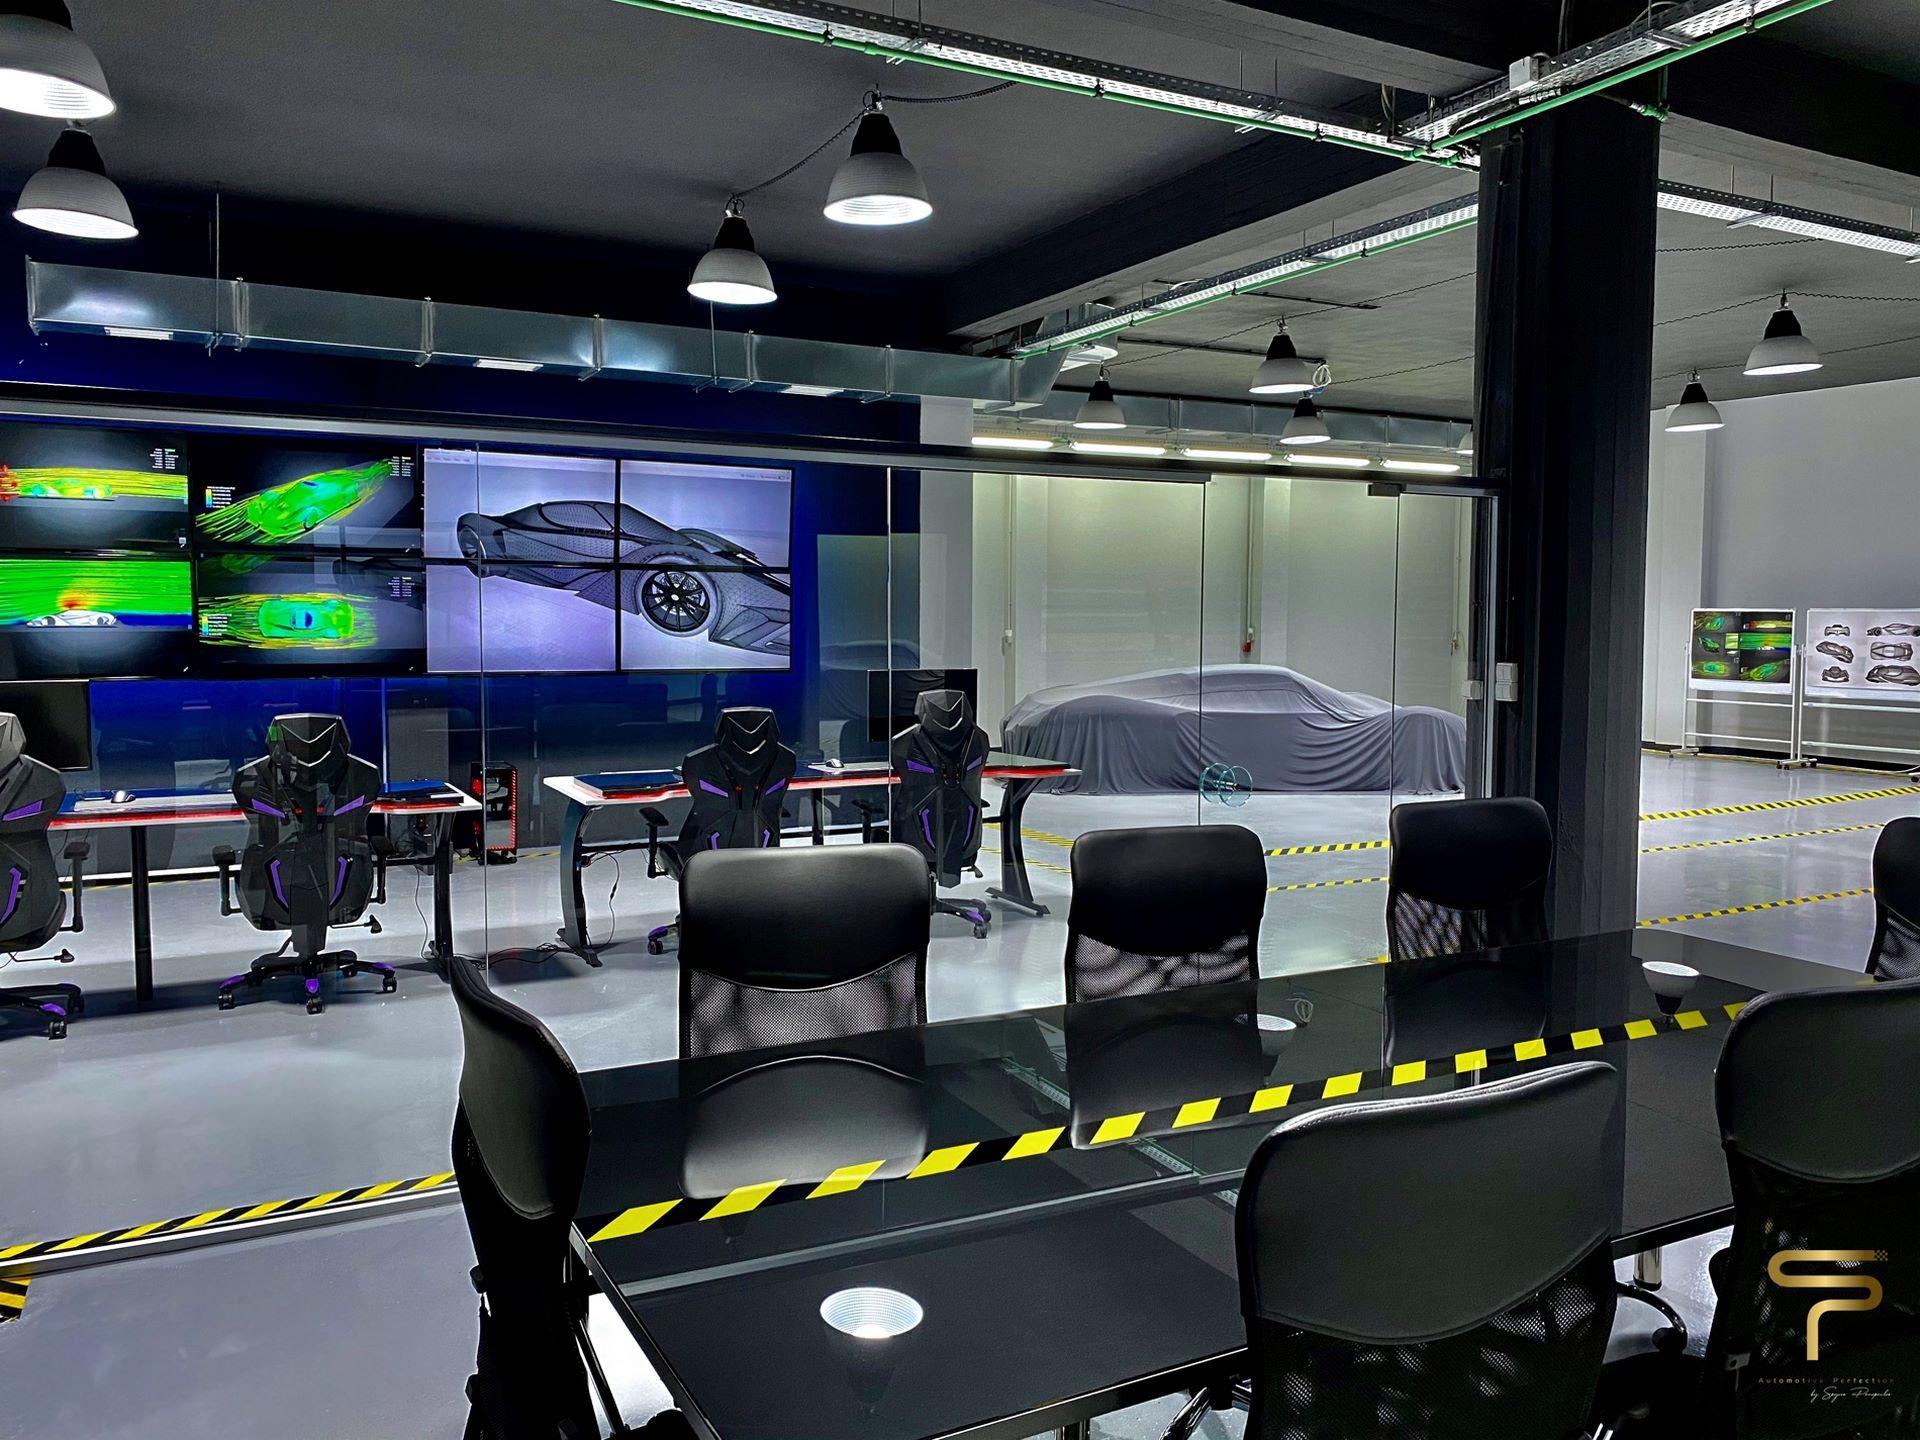 Spyros-Panopoulos-Automotive-Chaos-8